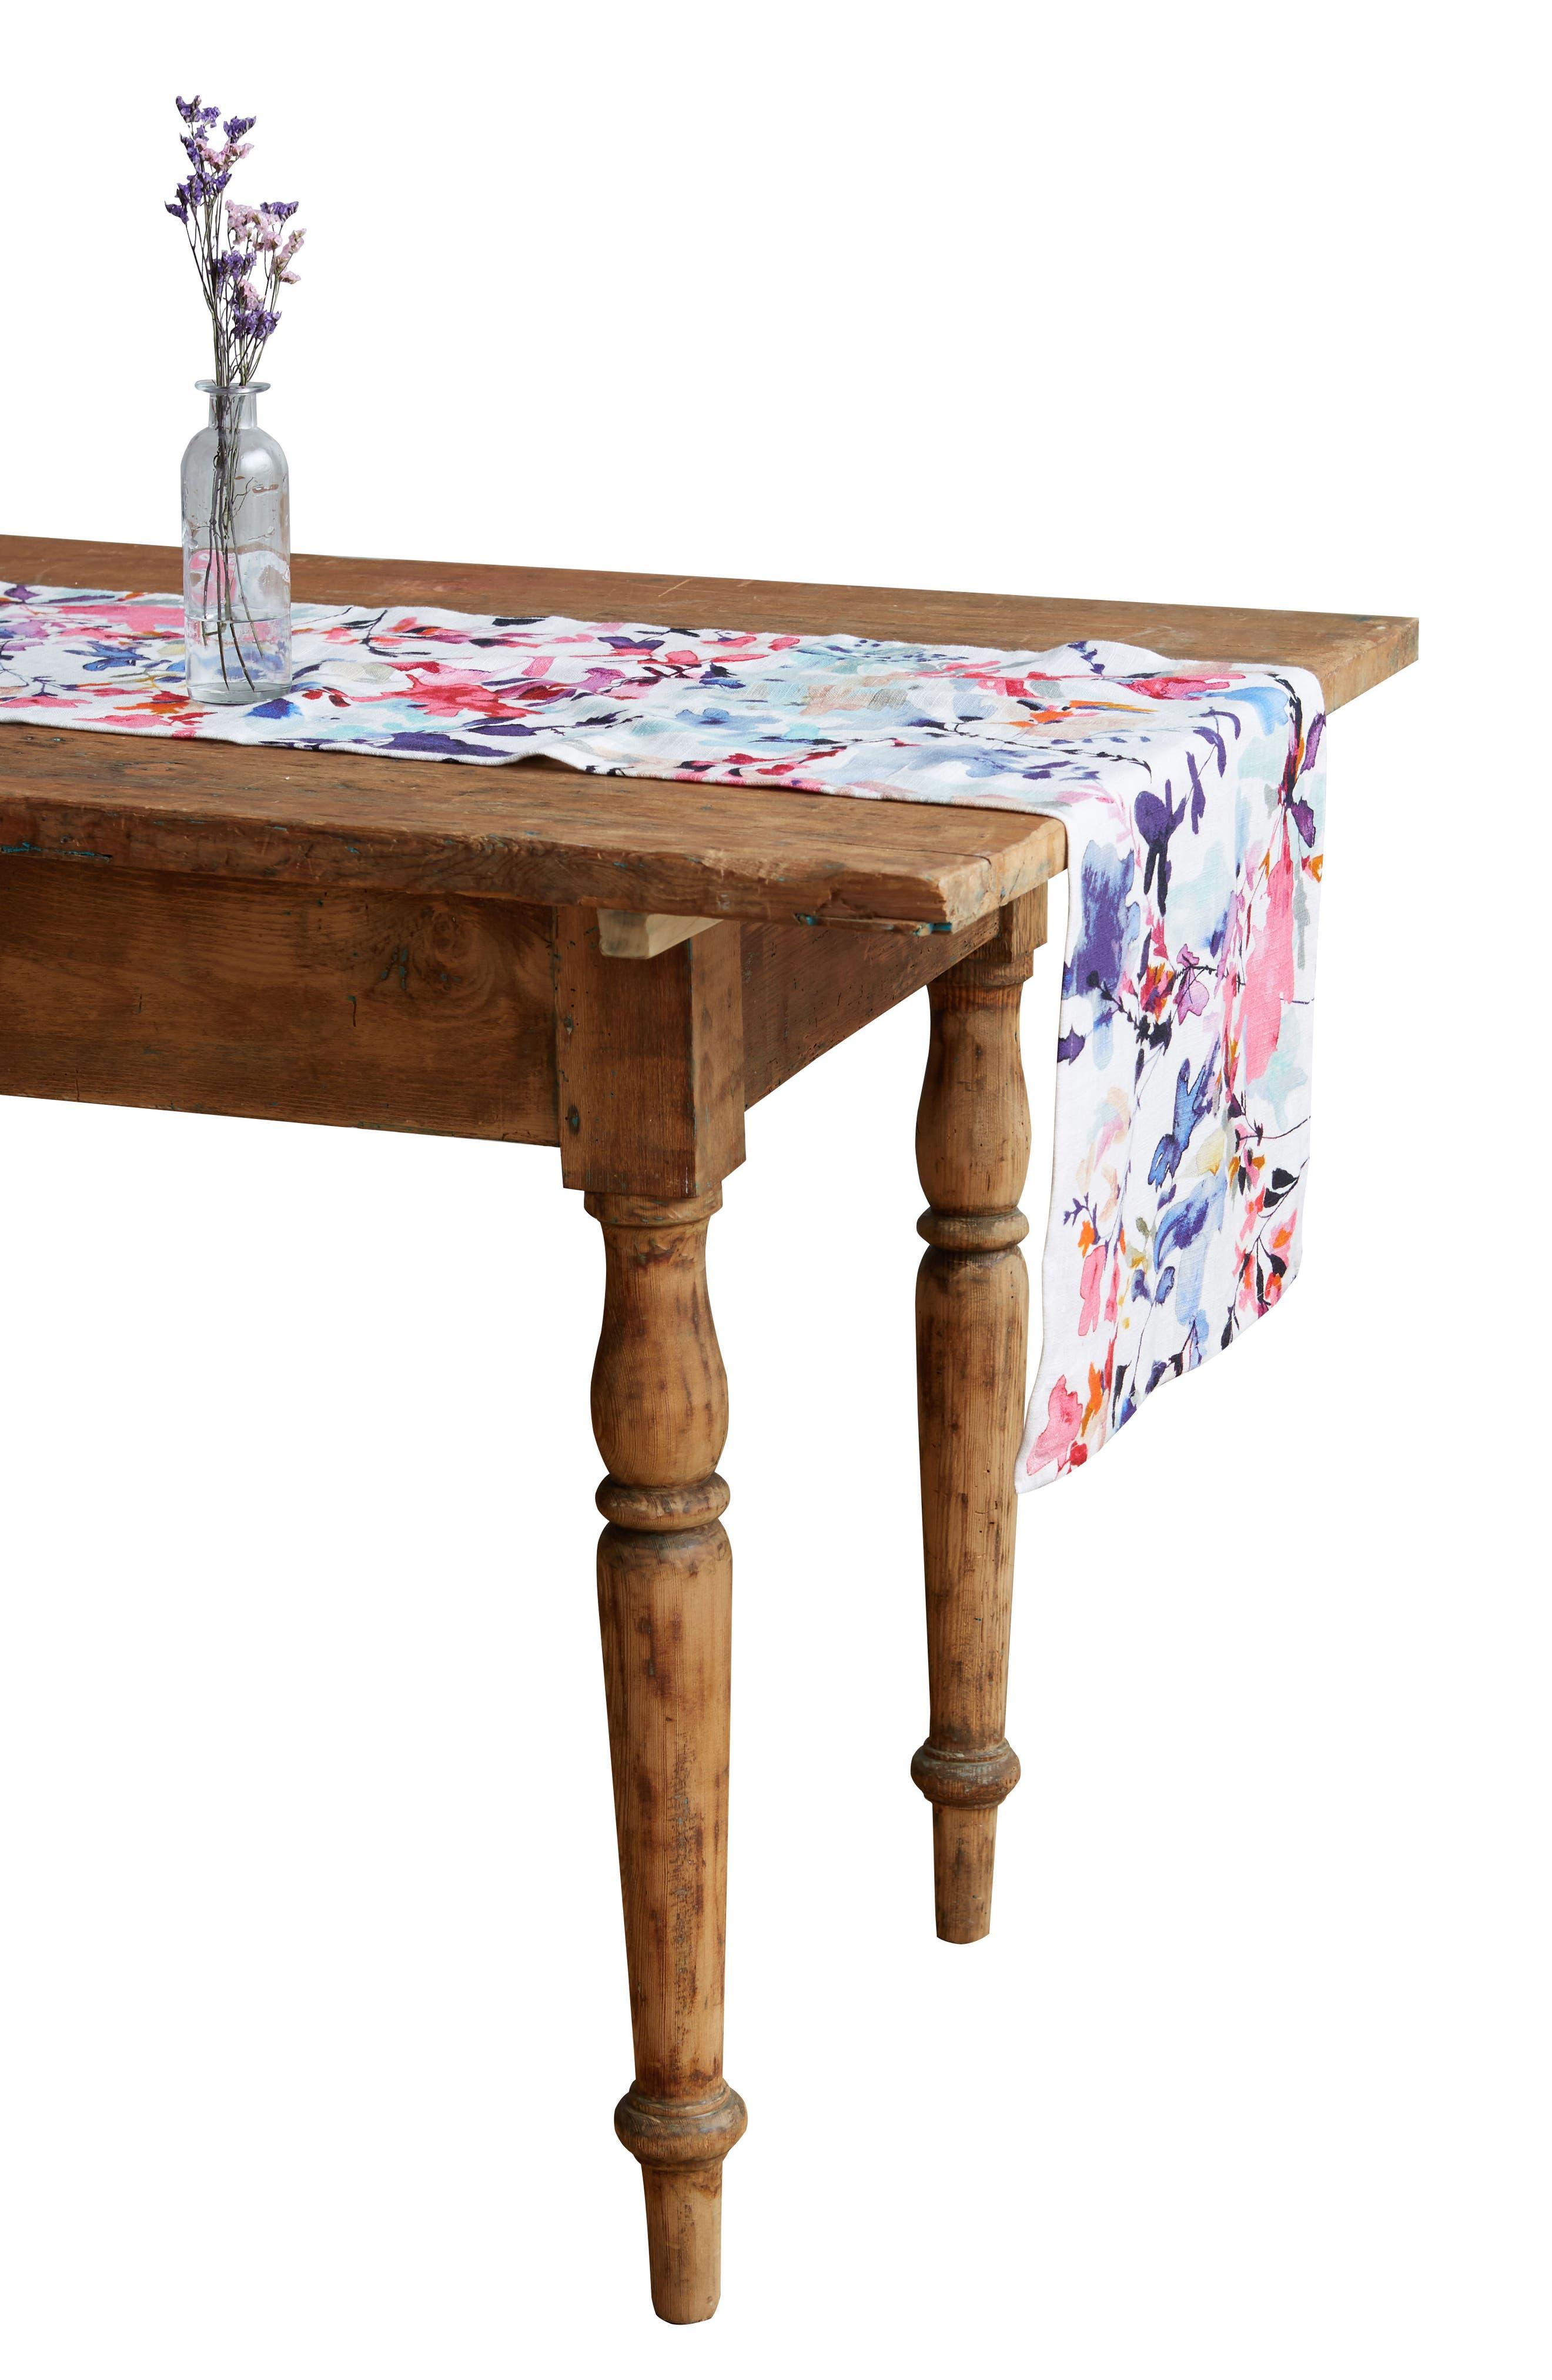 Wildflower Study Table Runner,                             Alternate thumbnail 3, color,                             650